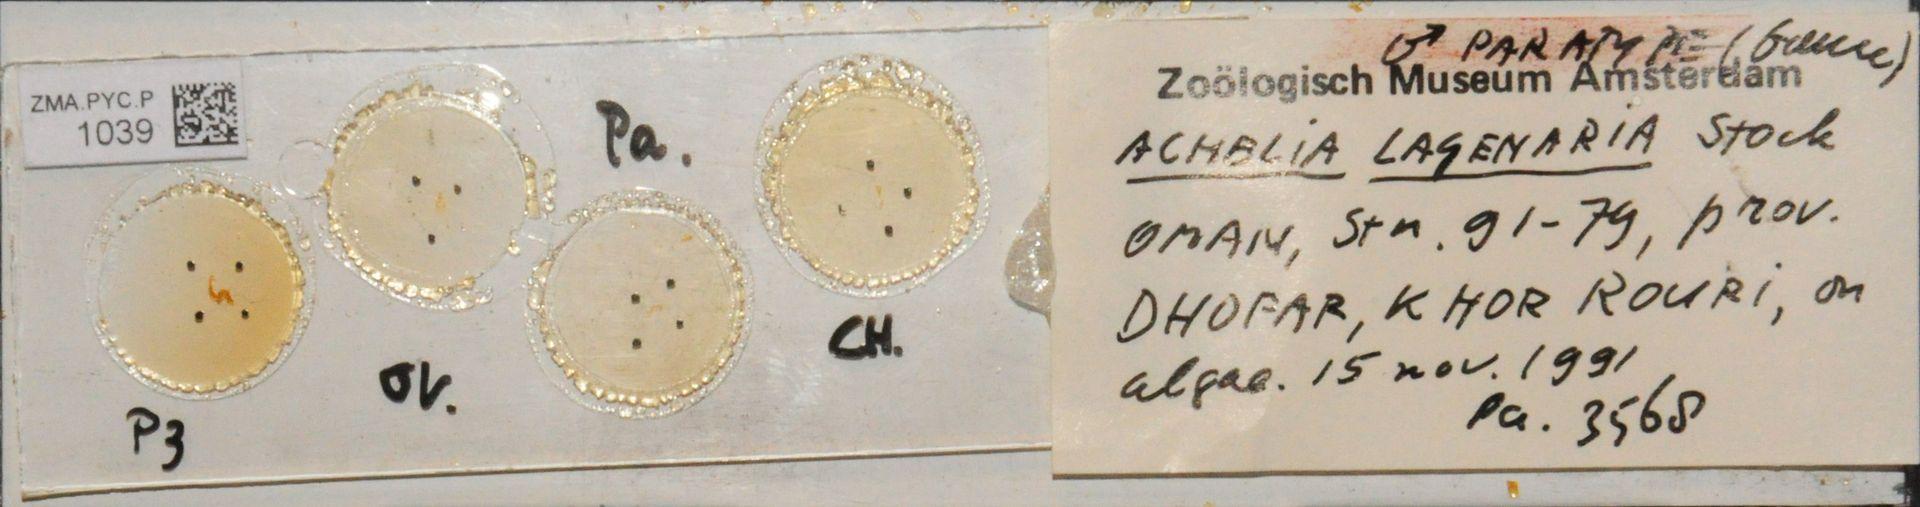 ZMA.PYC.P.1039 | Achelia lagenaria Stock, 1992